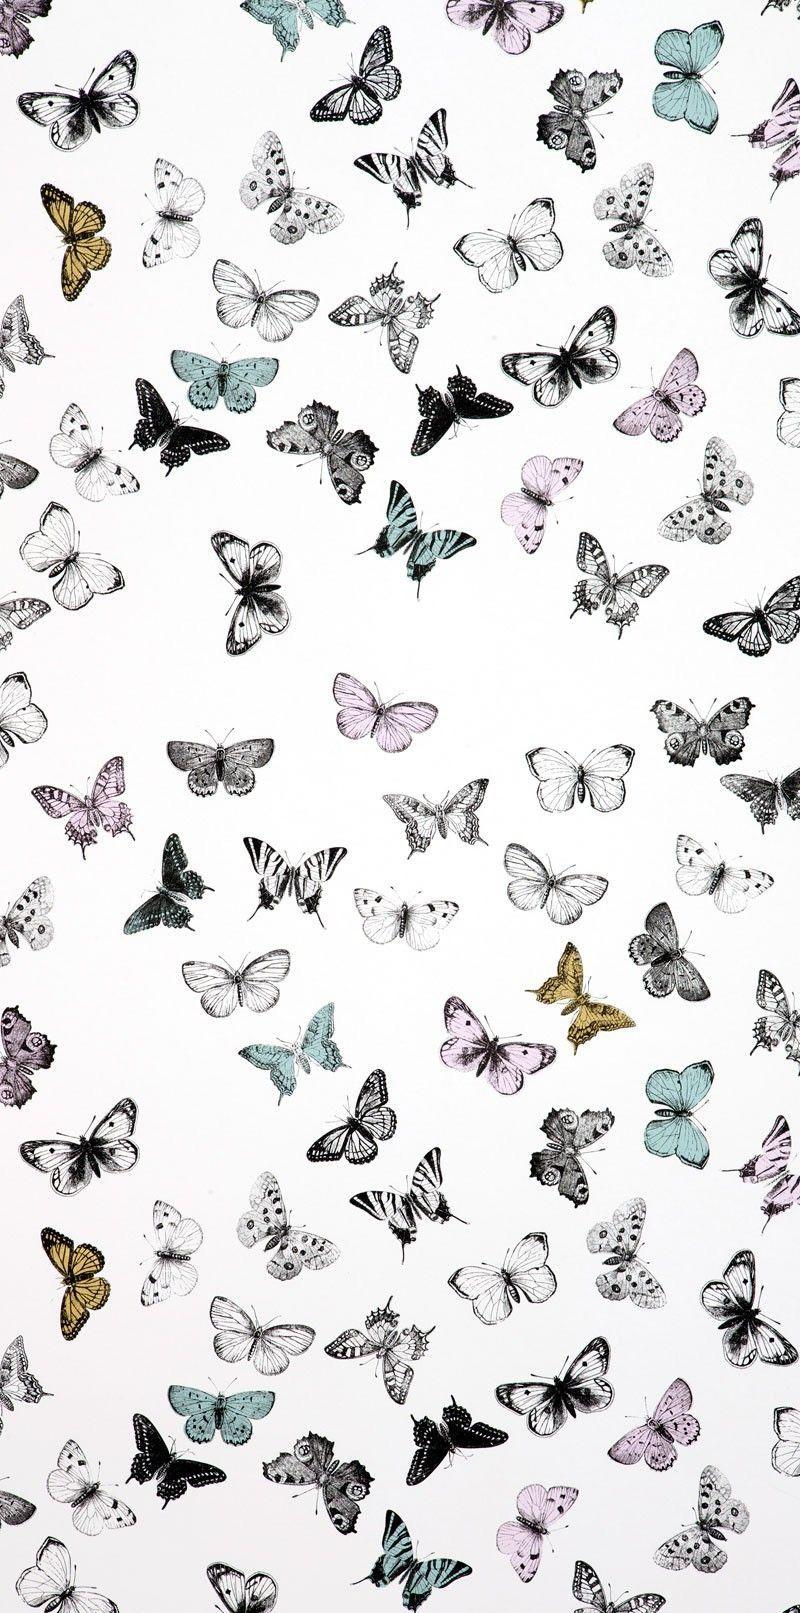 B Utterflies Butterfly Wallpaper Iphone Butterfly Wallpaper